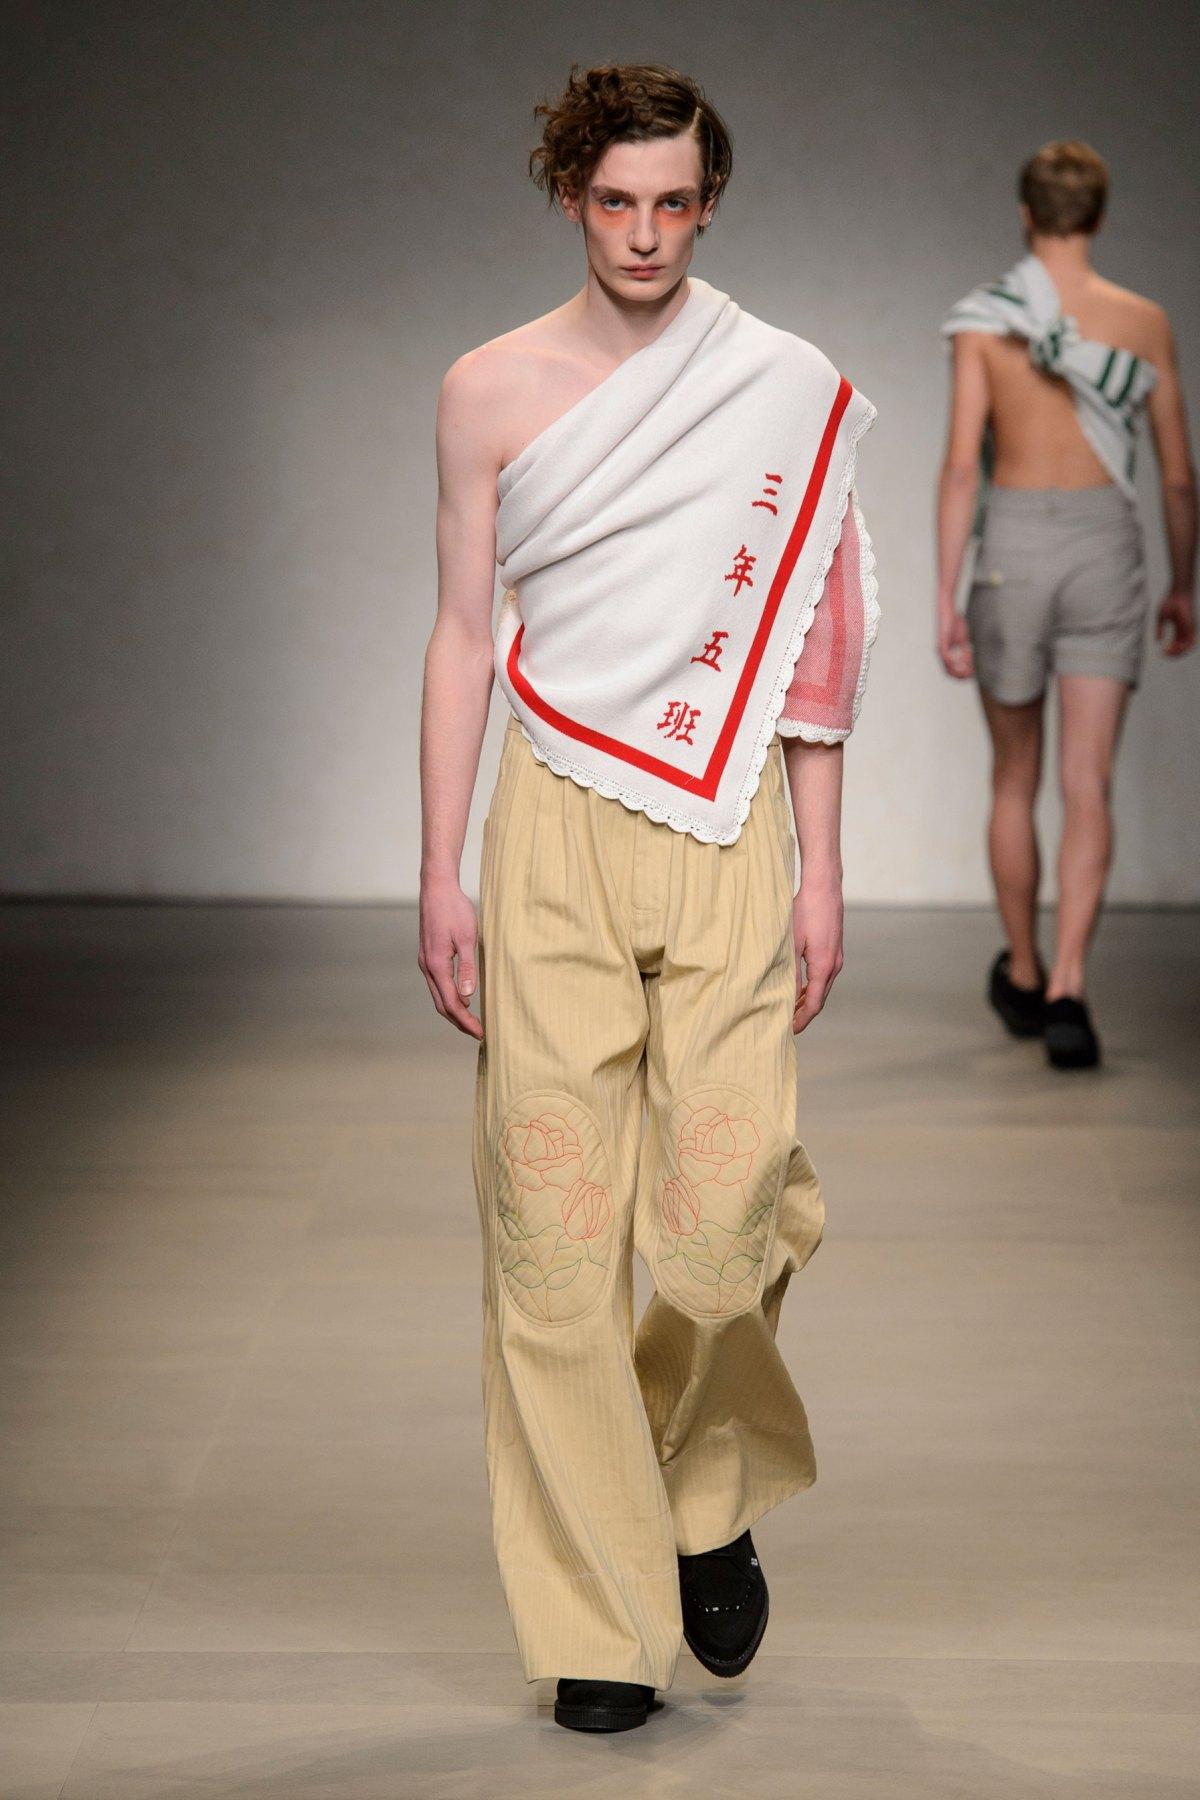 Giovani Designer m RF17 0547